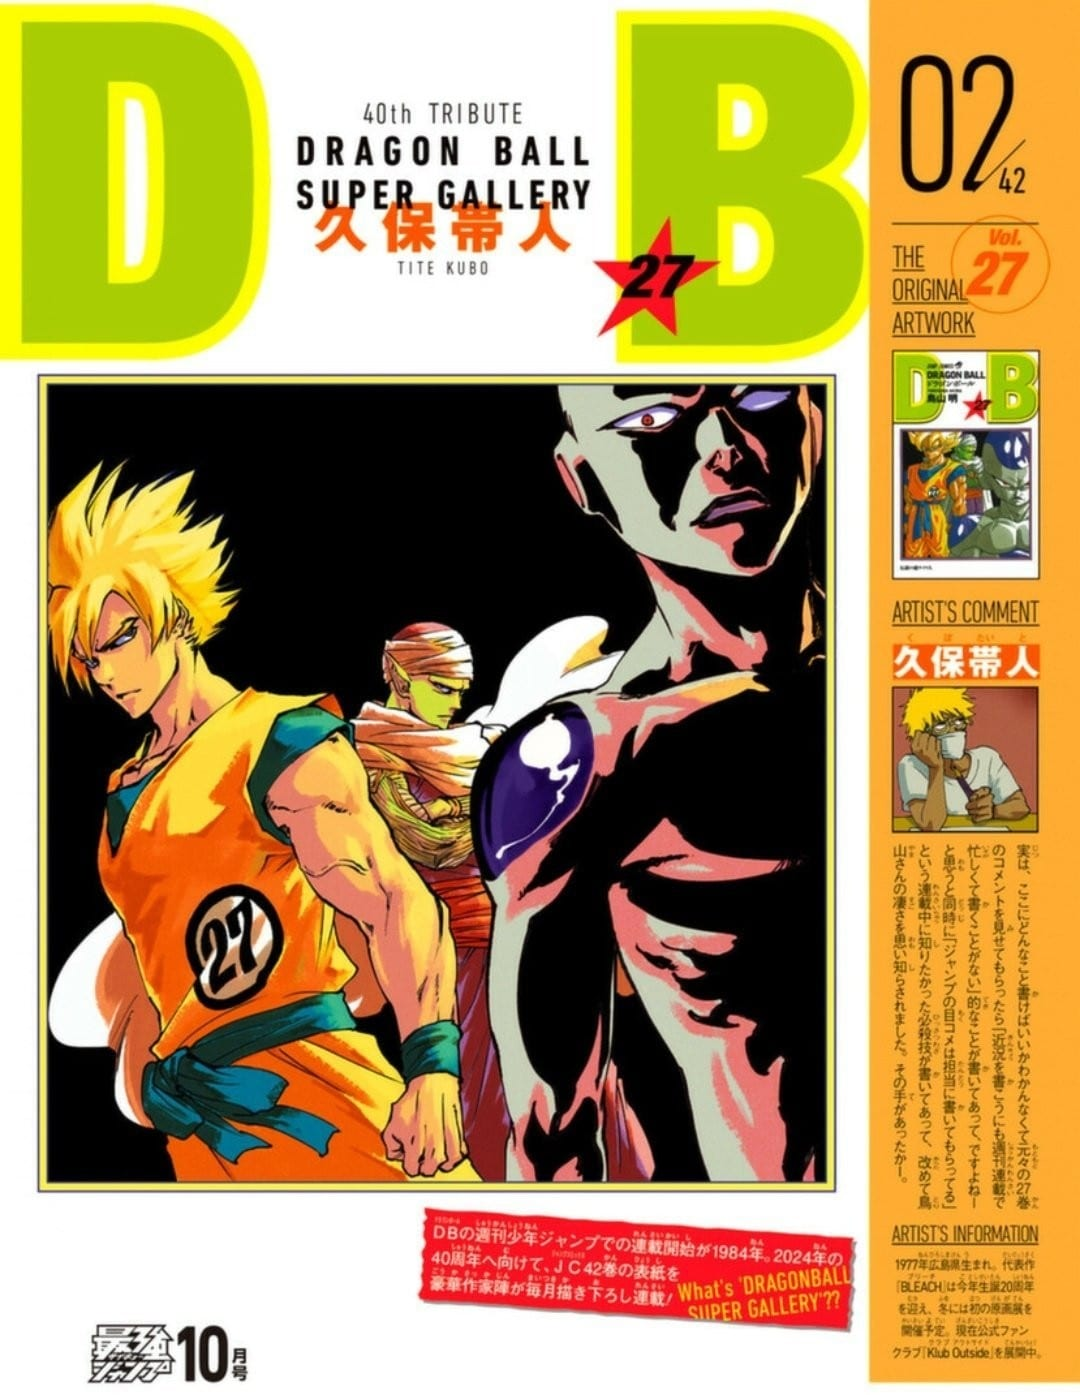 dragon ball super gallery 2 tite kubo